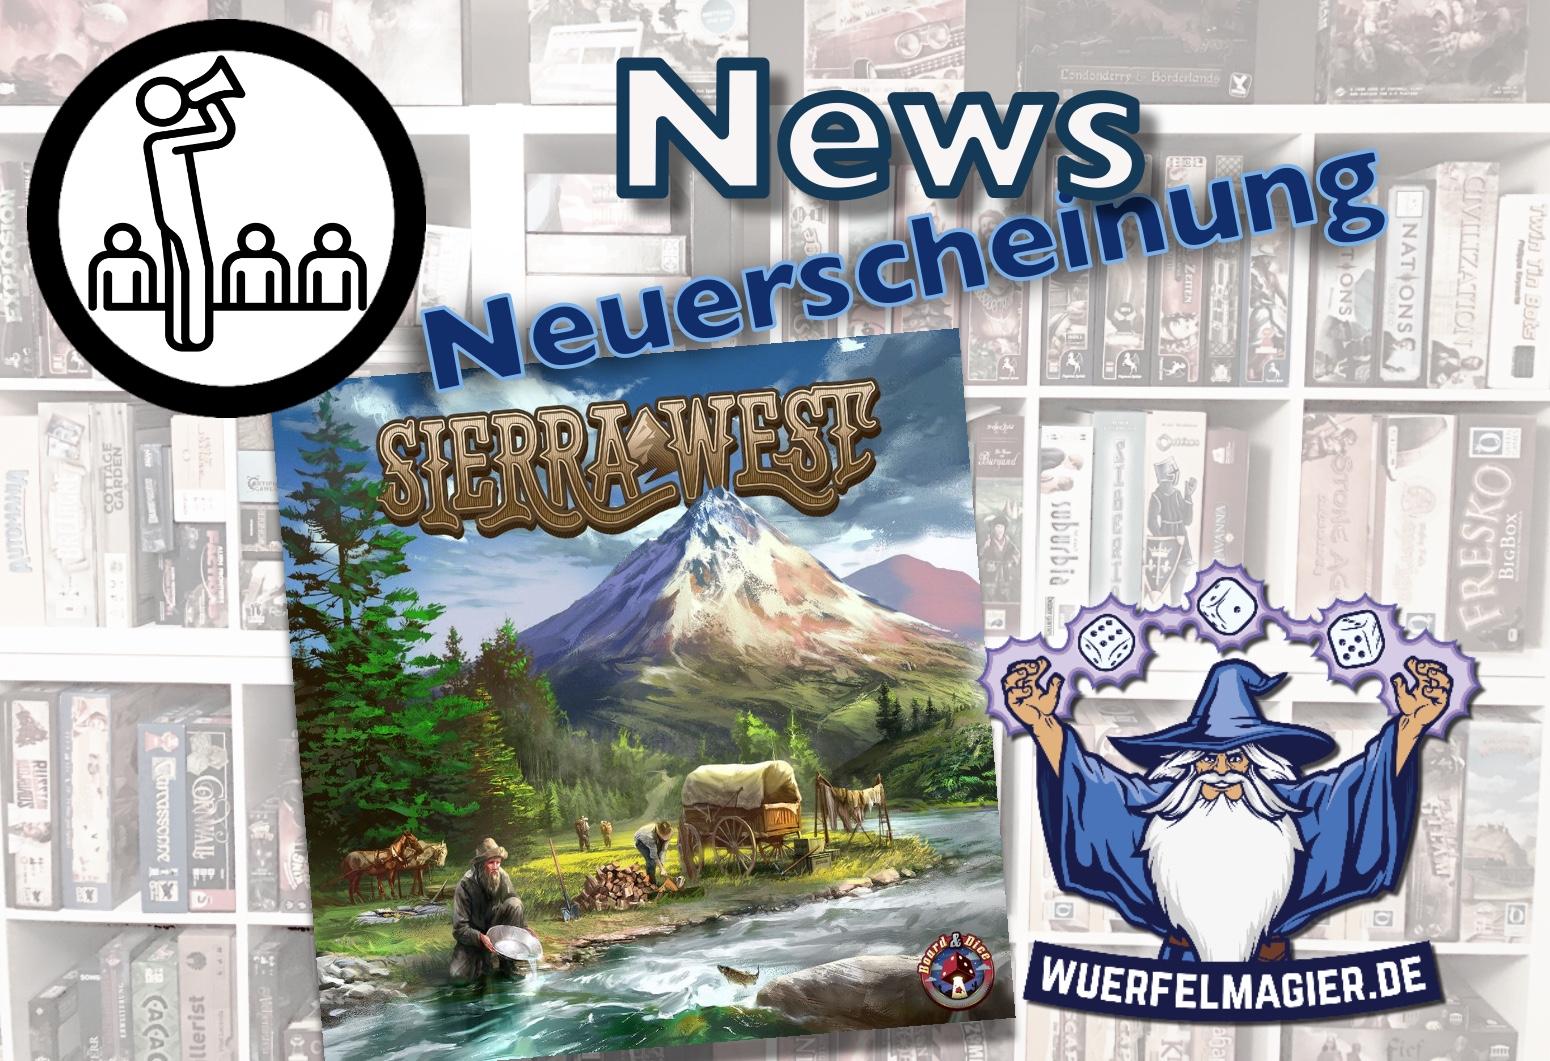 Sierra West Board and Dice News Neuerscheinung Wuerfelmagier Würfelmagier